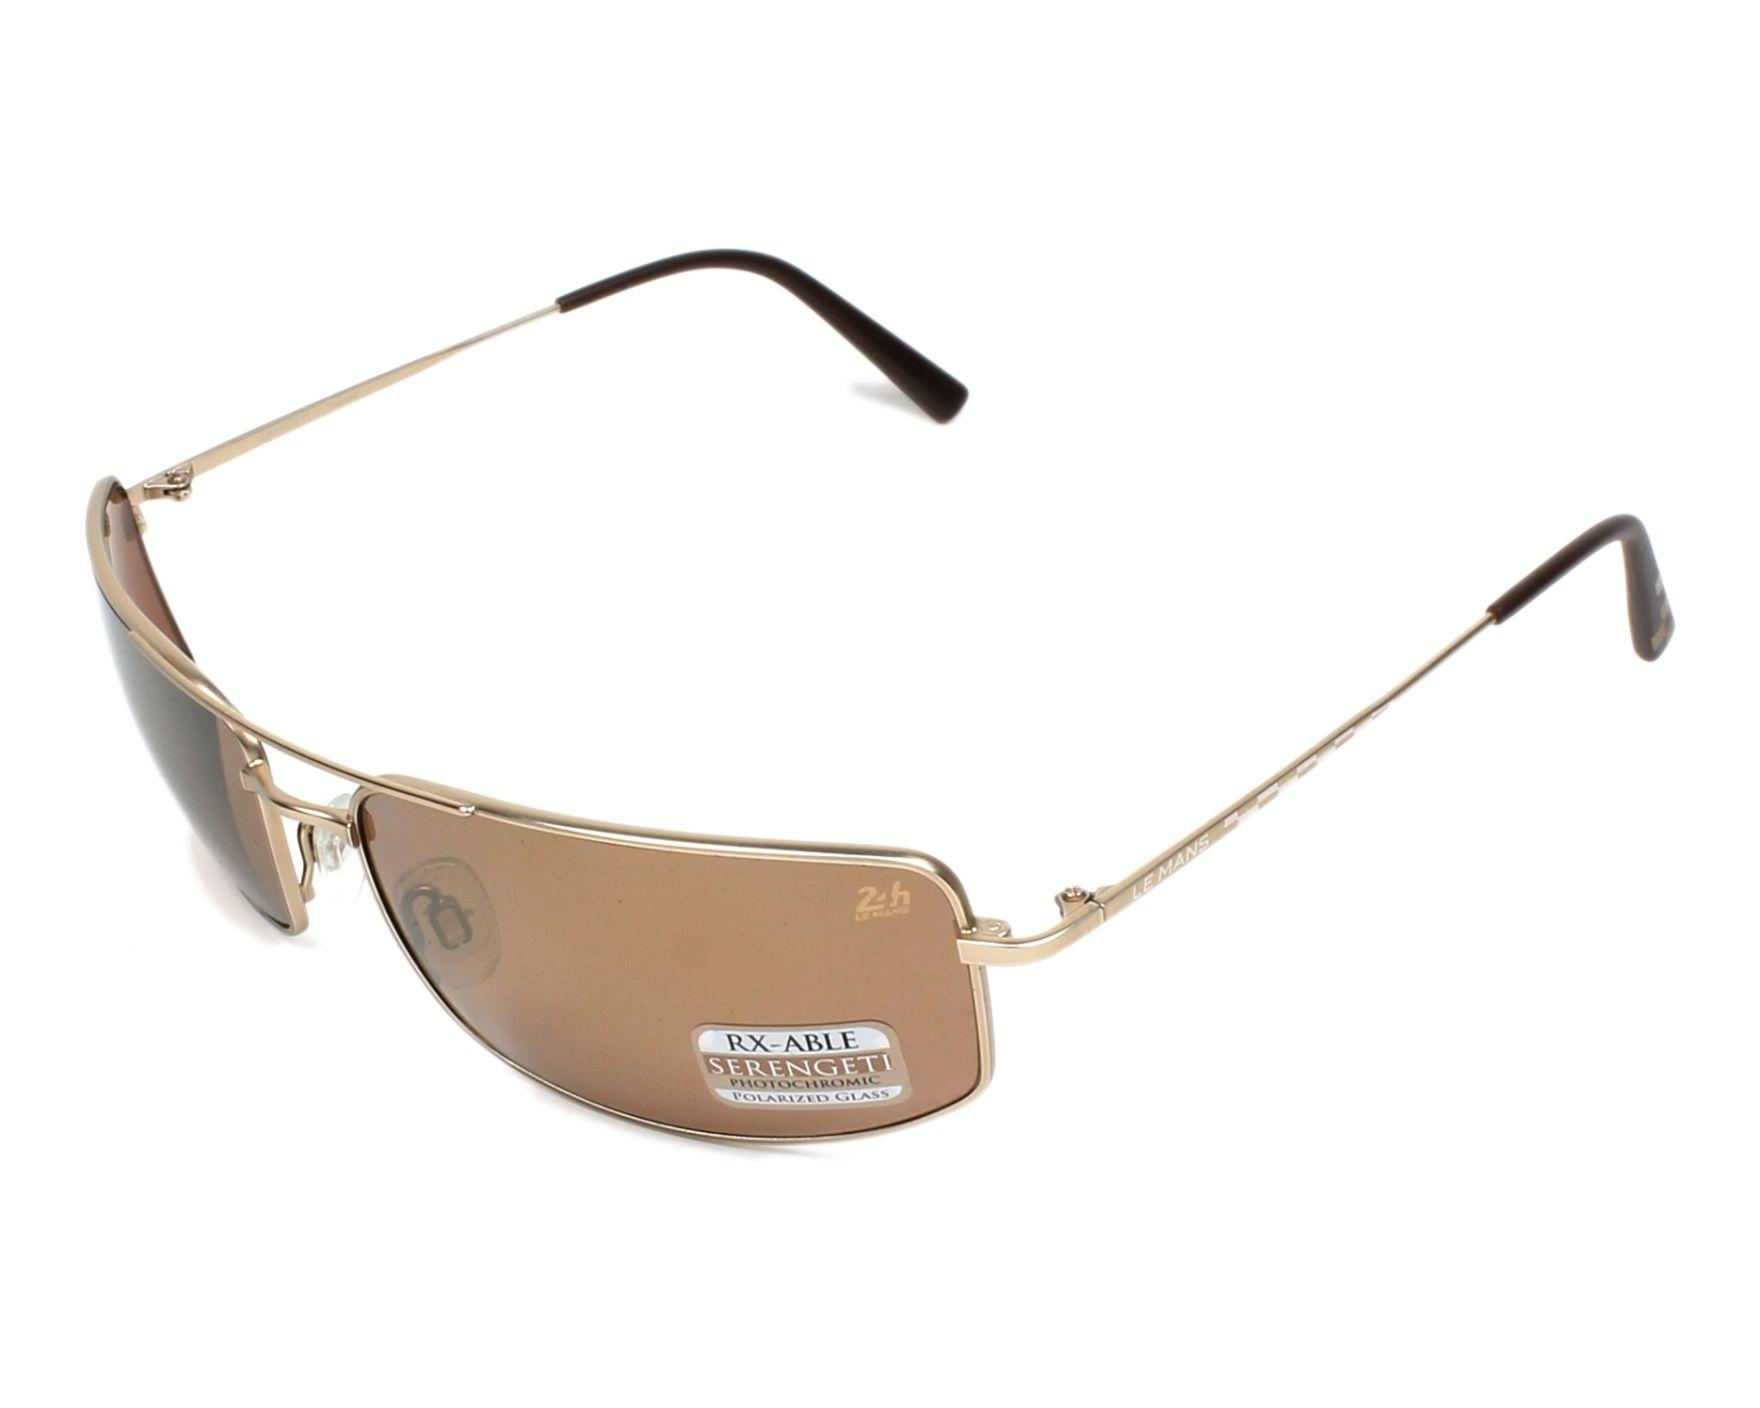 6889d25562 Sunglasses Serengeti TREVISO 8484 65-17 Gold profile view